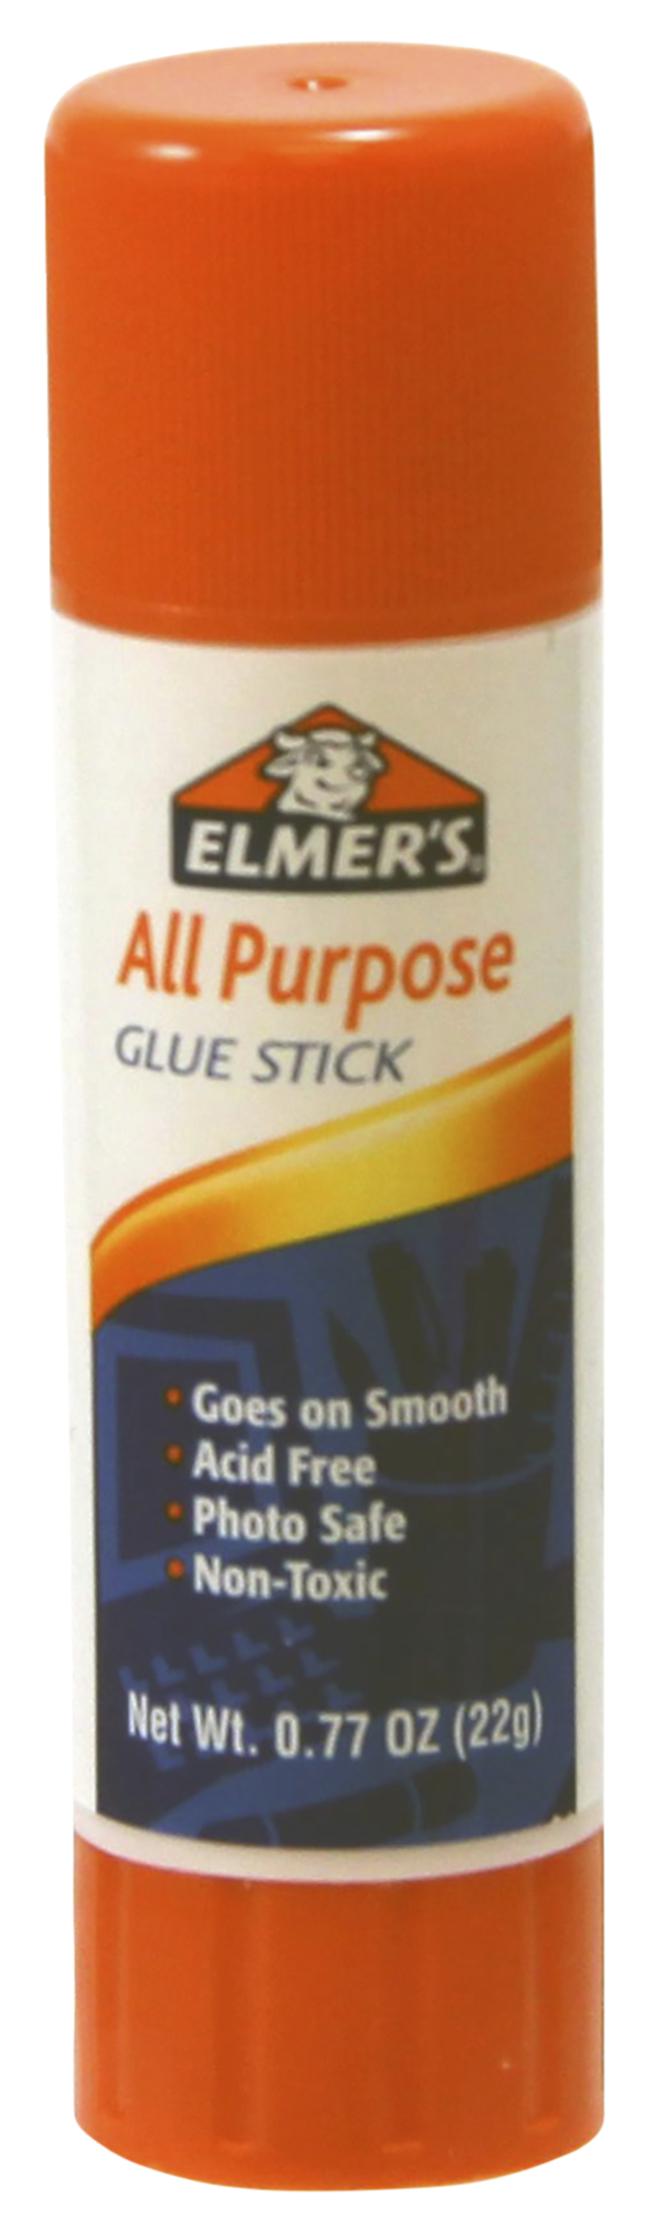 Glue Sticks, Item Number 213964